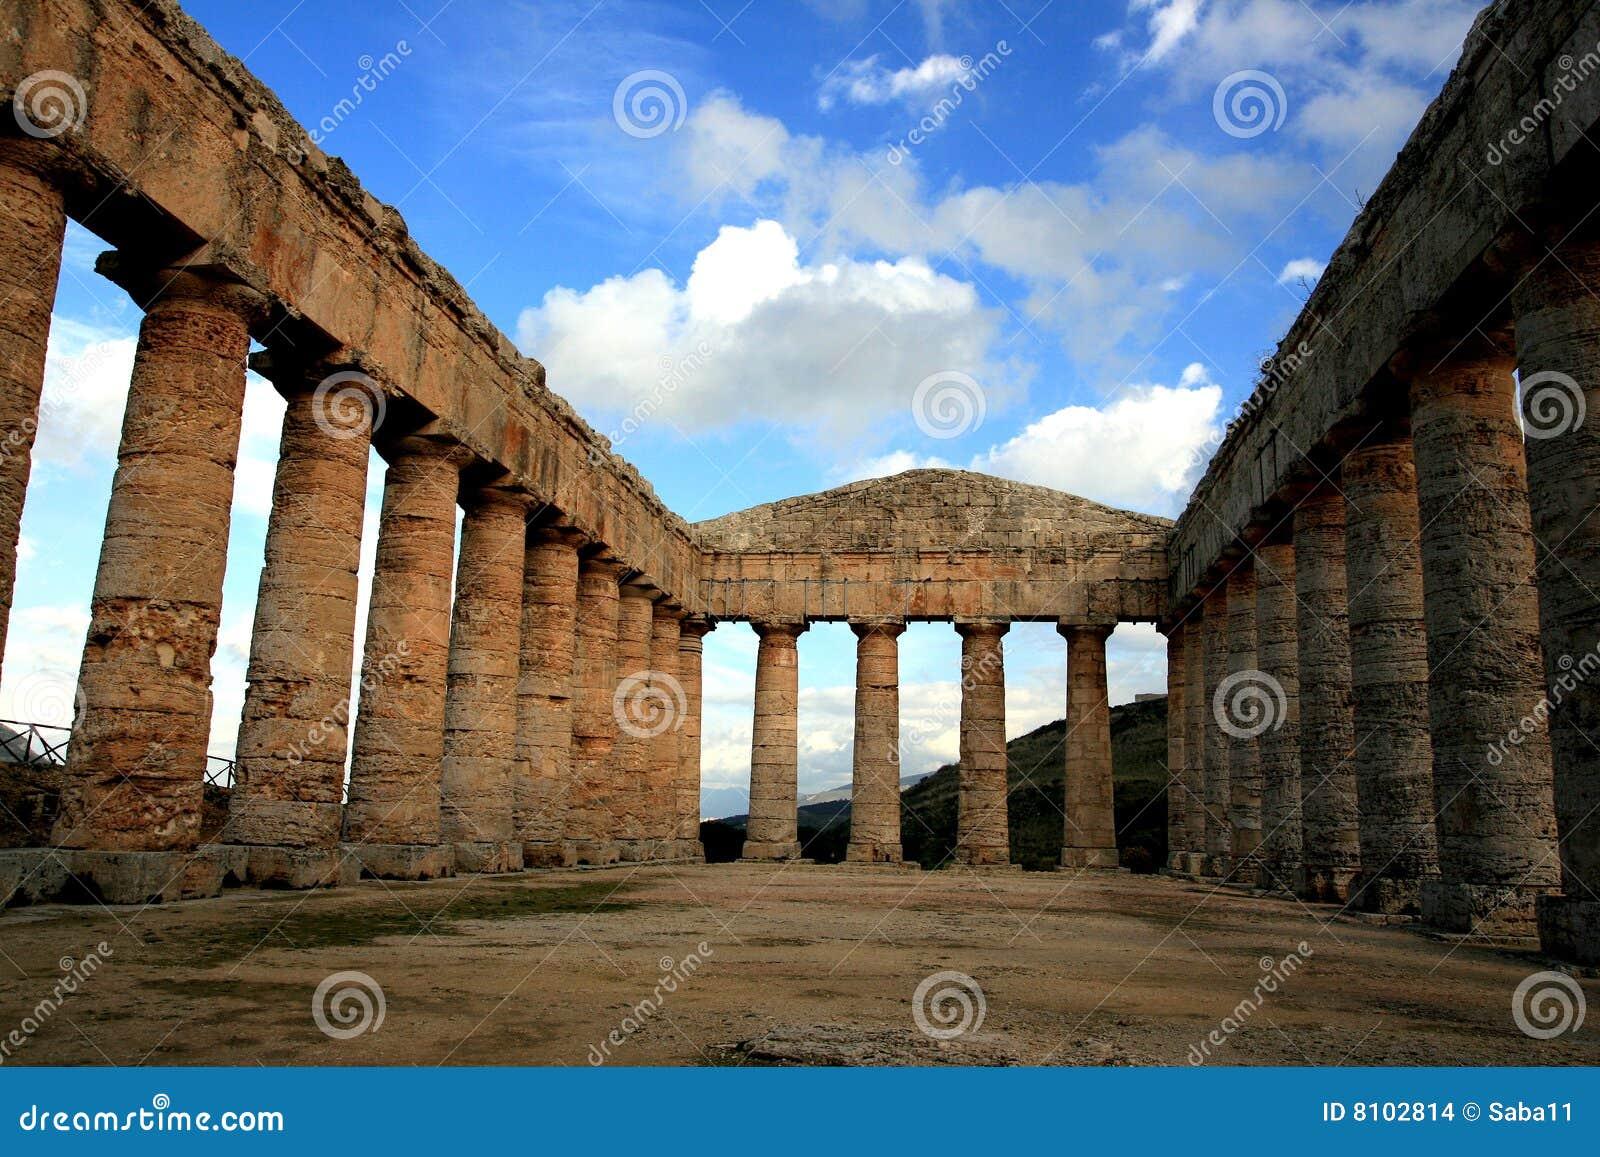 Templo do grego clássico de Segesta, Italy